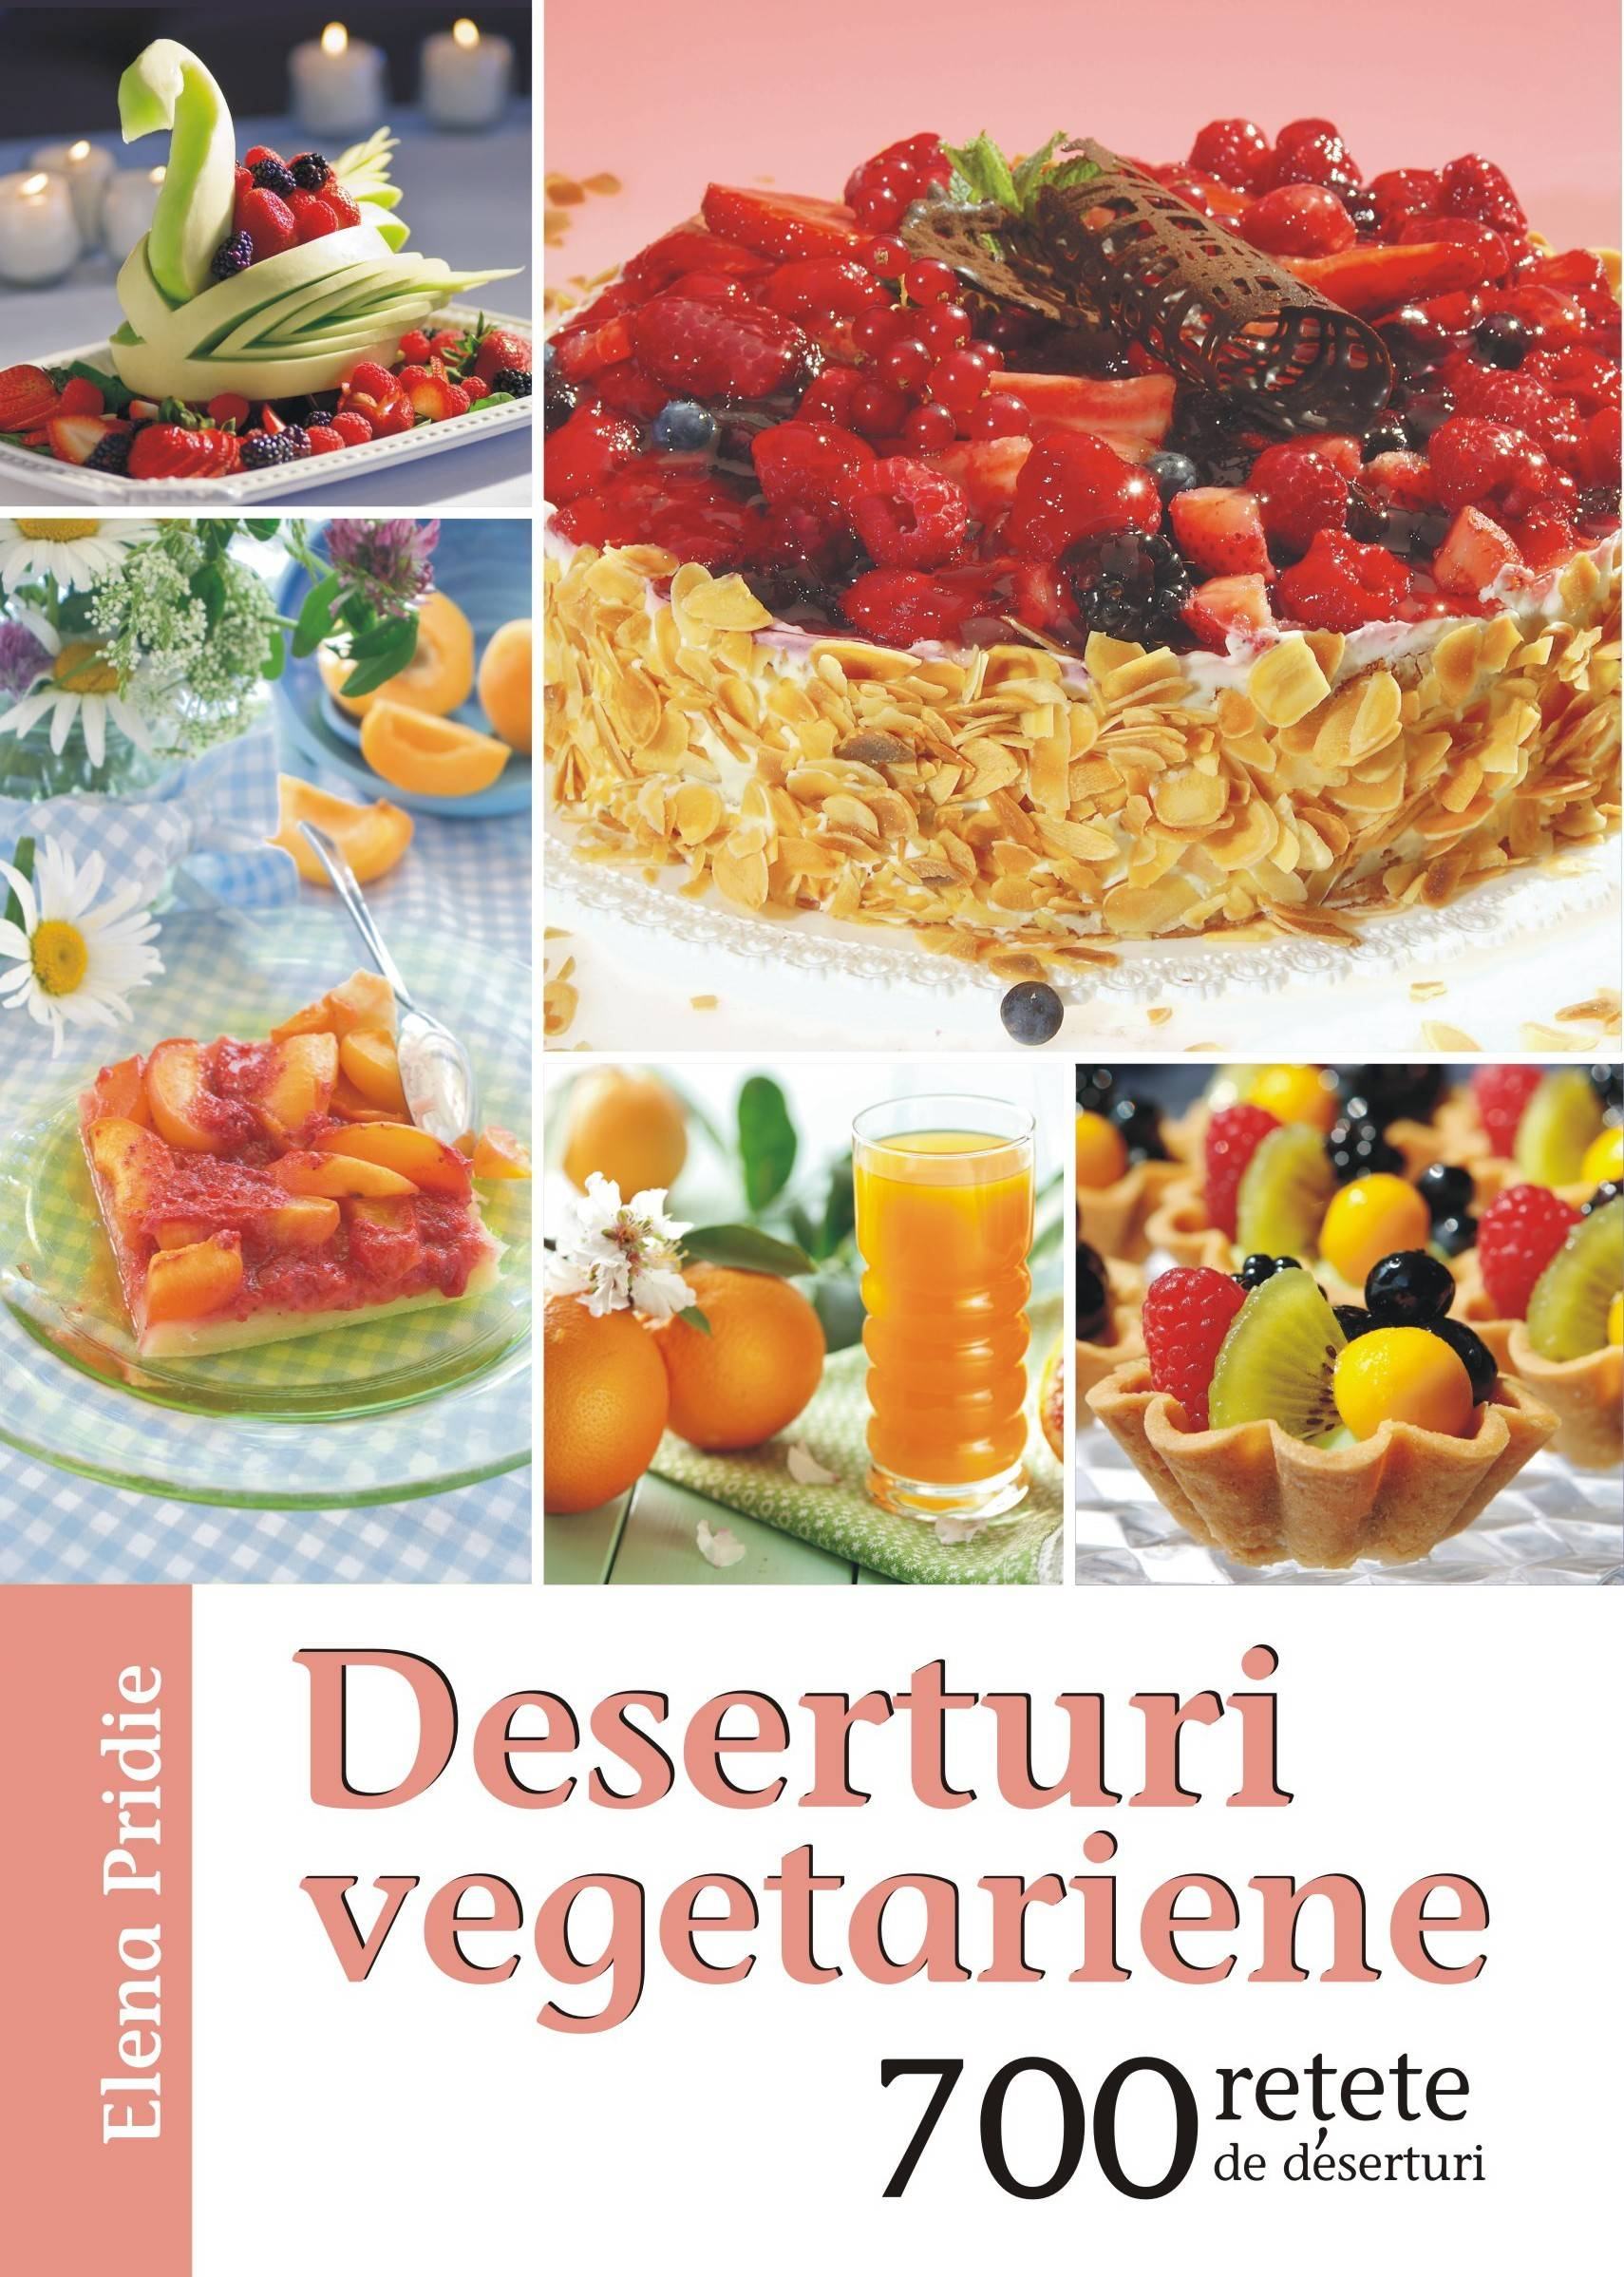 Deserturi vegetariene thumbnail